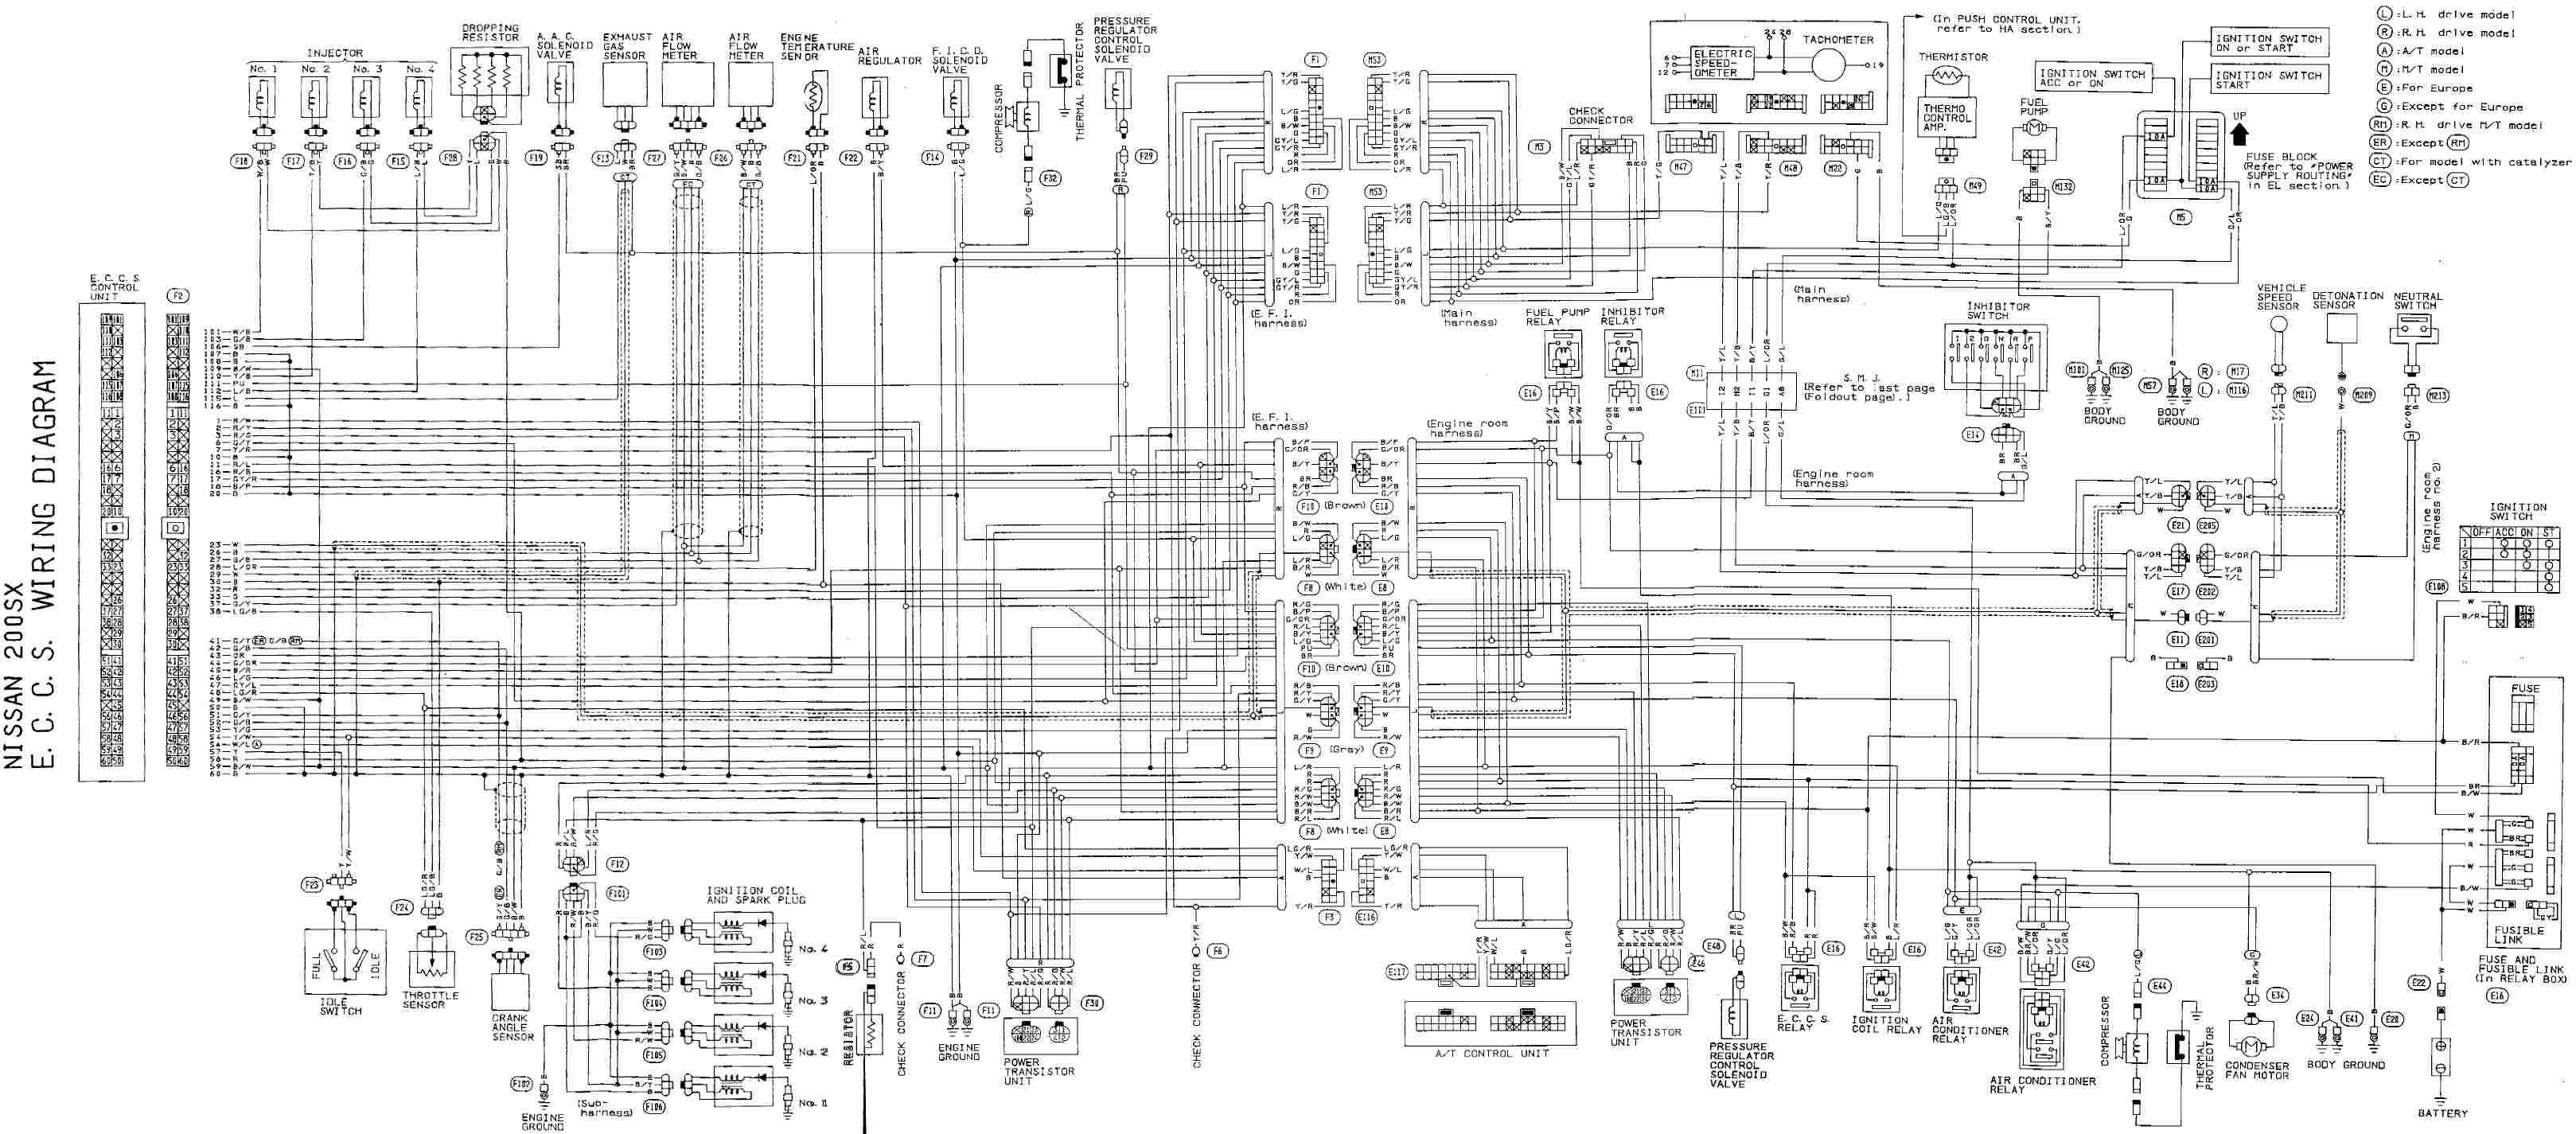 wiring diagram nissan sr20de example electrical wiring diagram u2022 rh huntervalleyhotels co